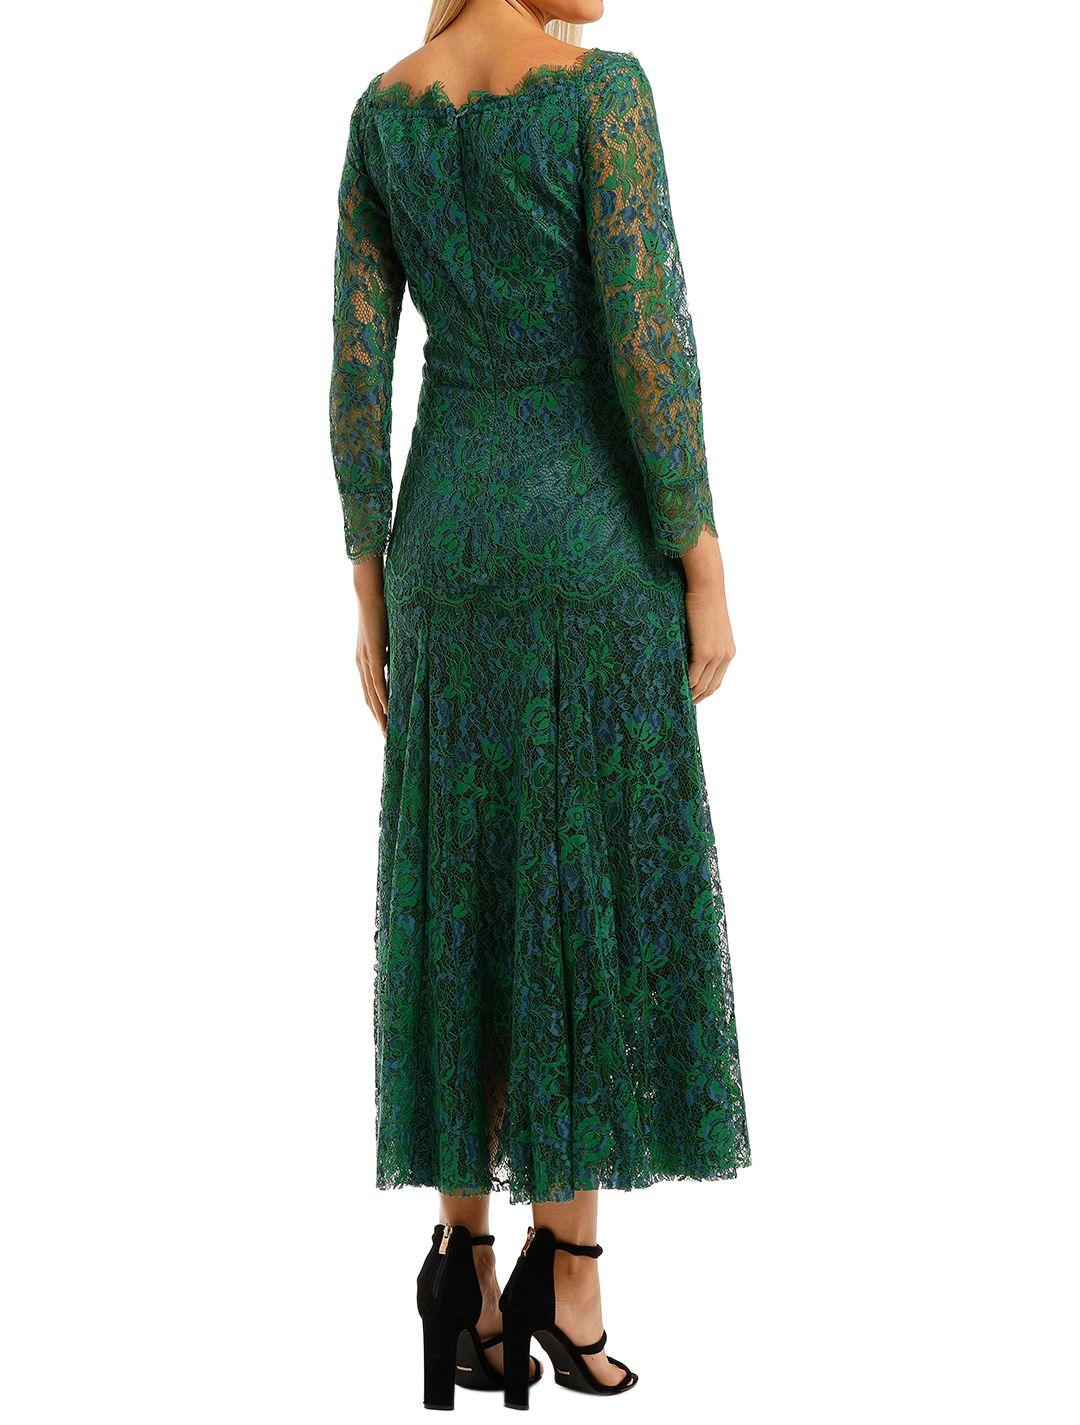 Moss-and-Spy-Kathleen-Dress-Emerad-Back